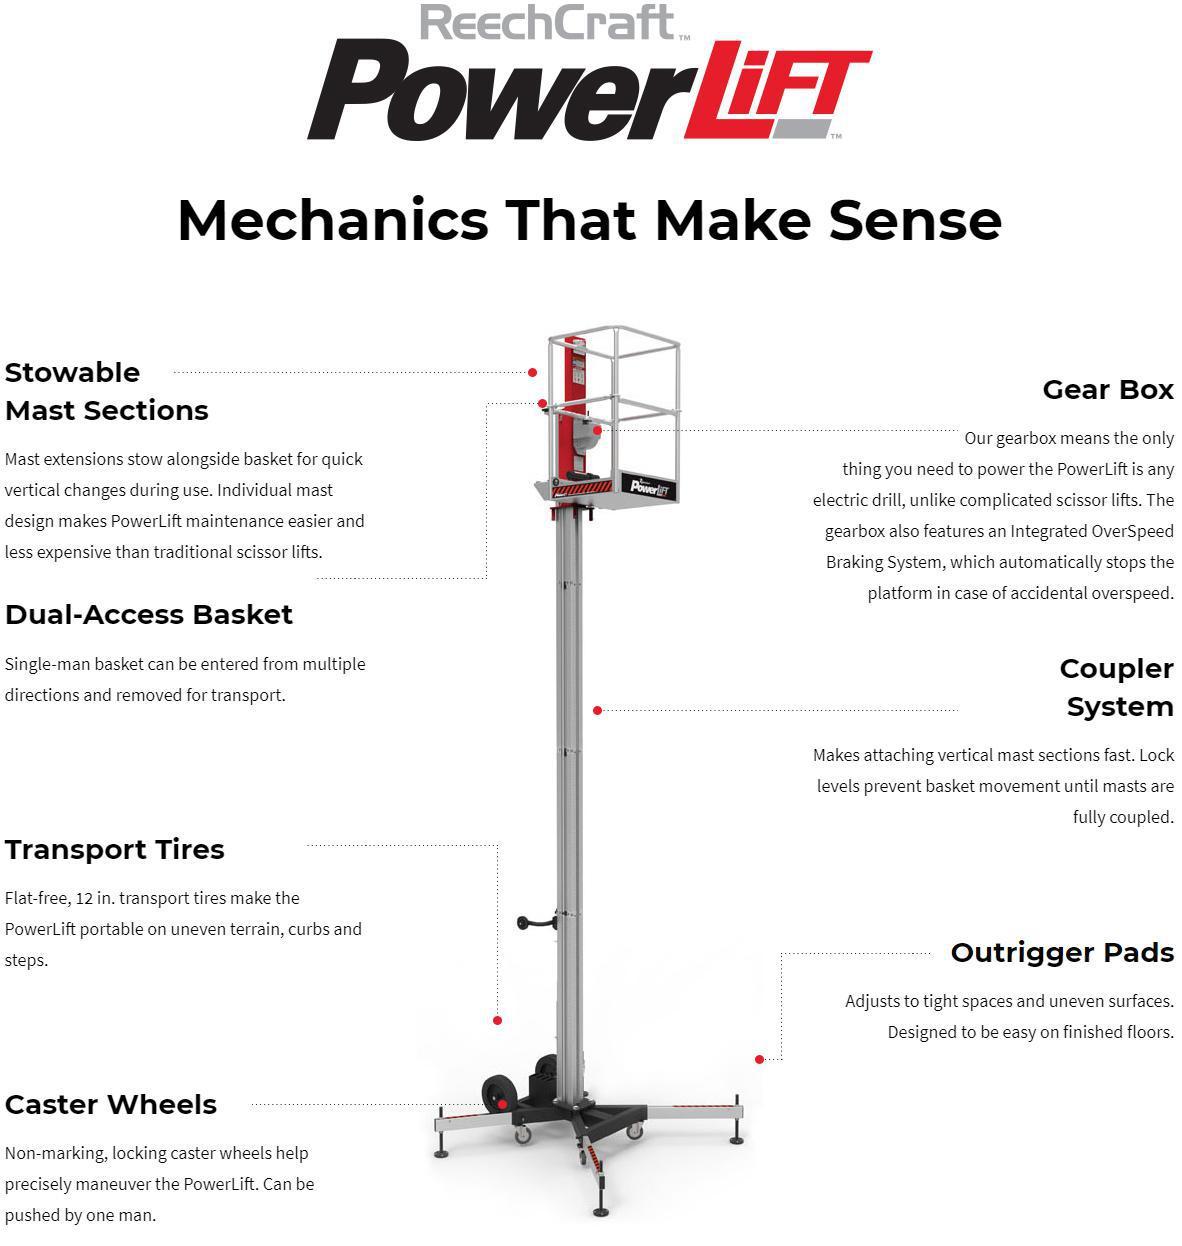 Reechcraft Powerlift